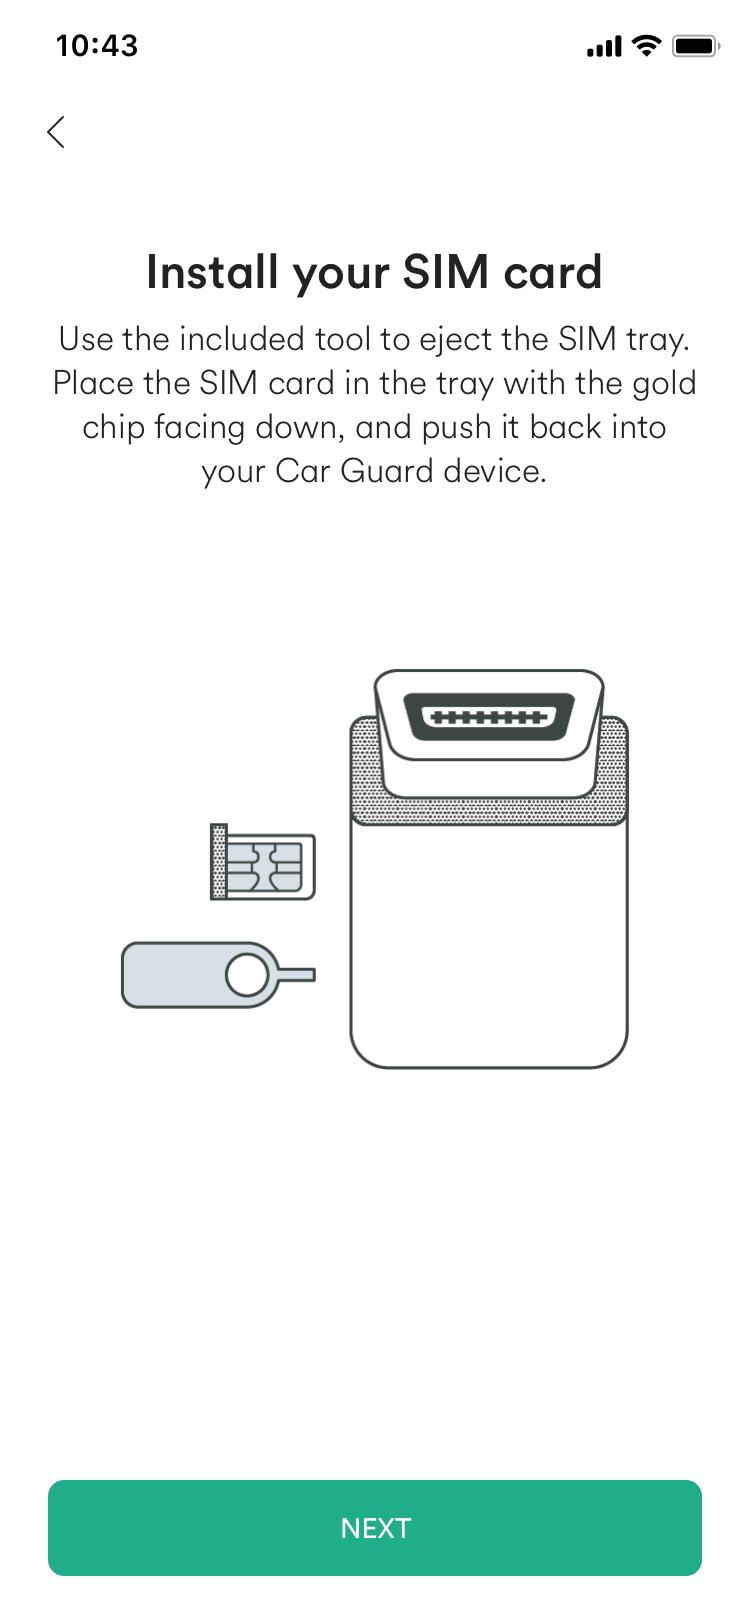 Car Guard - Installation Guide